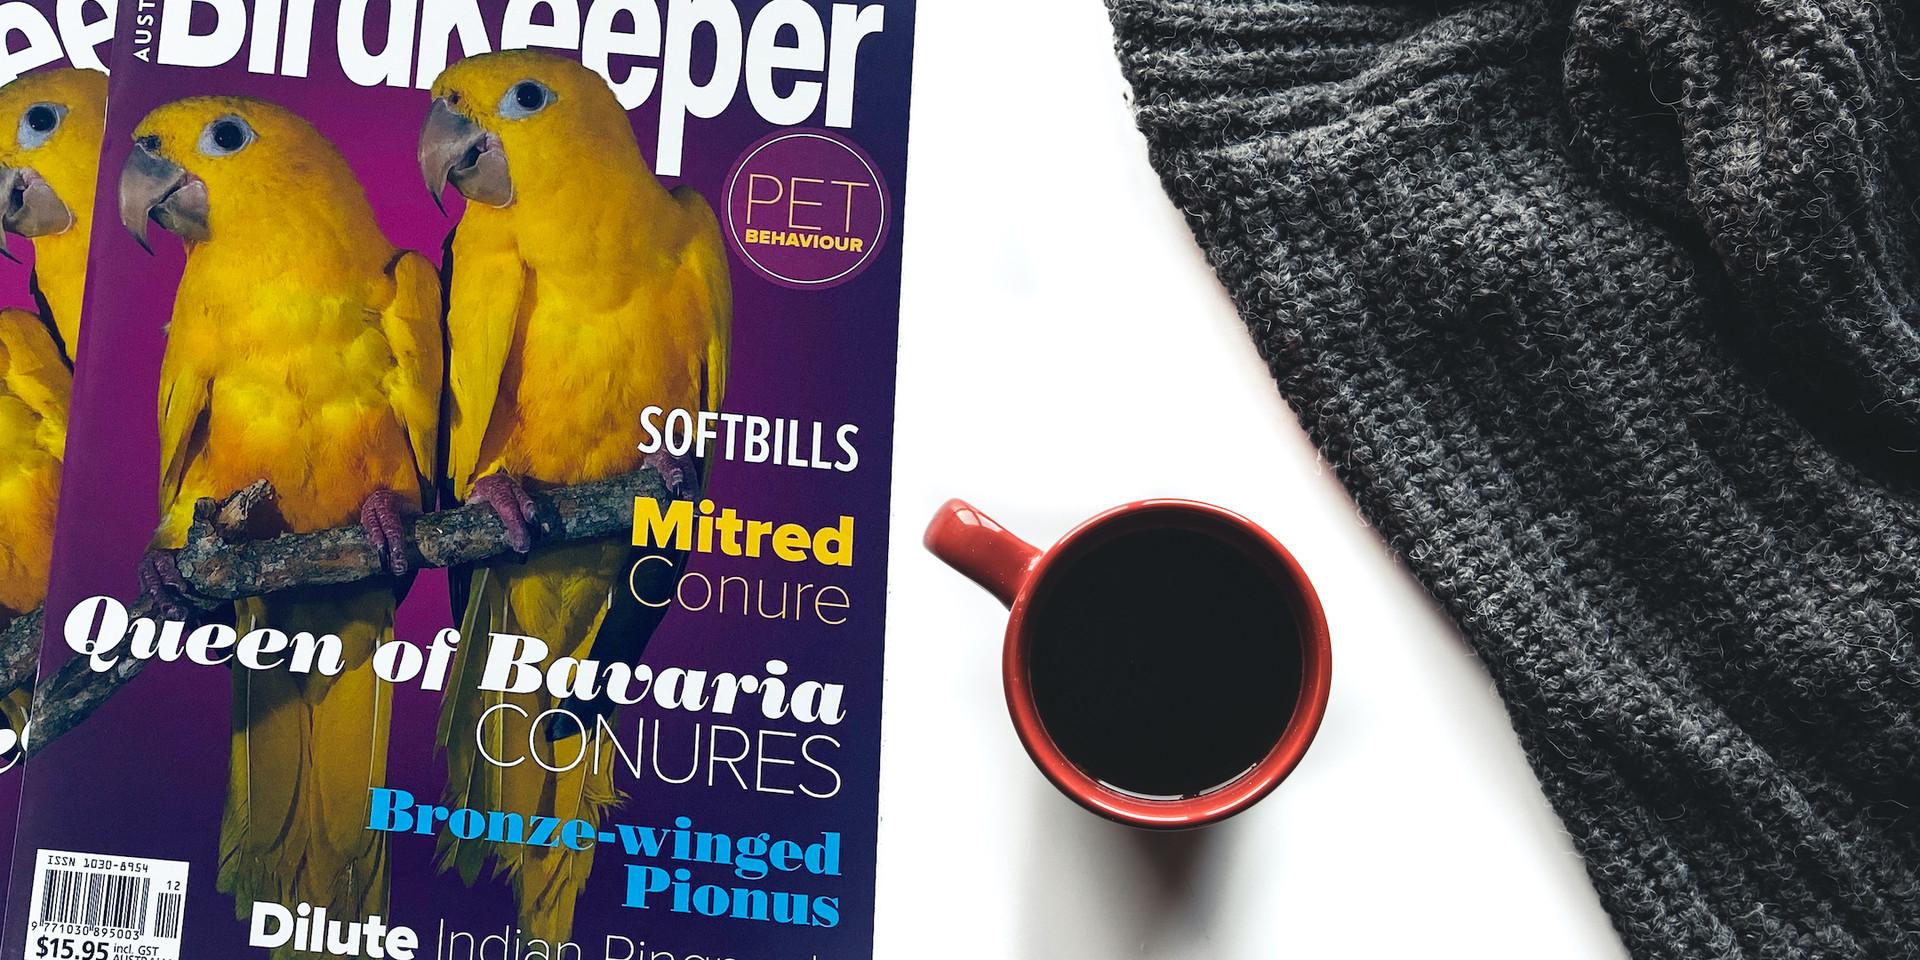 BirdKeeper Magazine